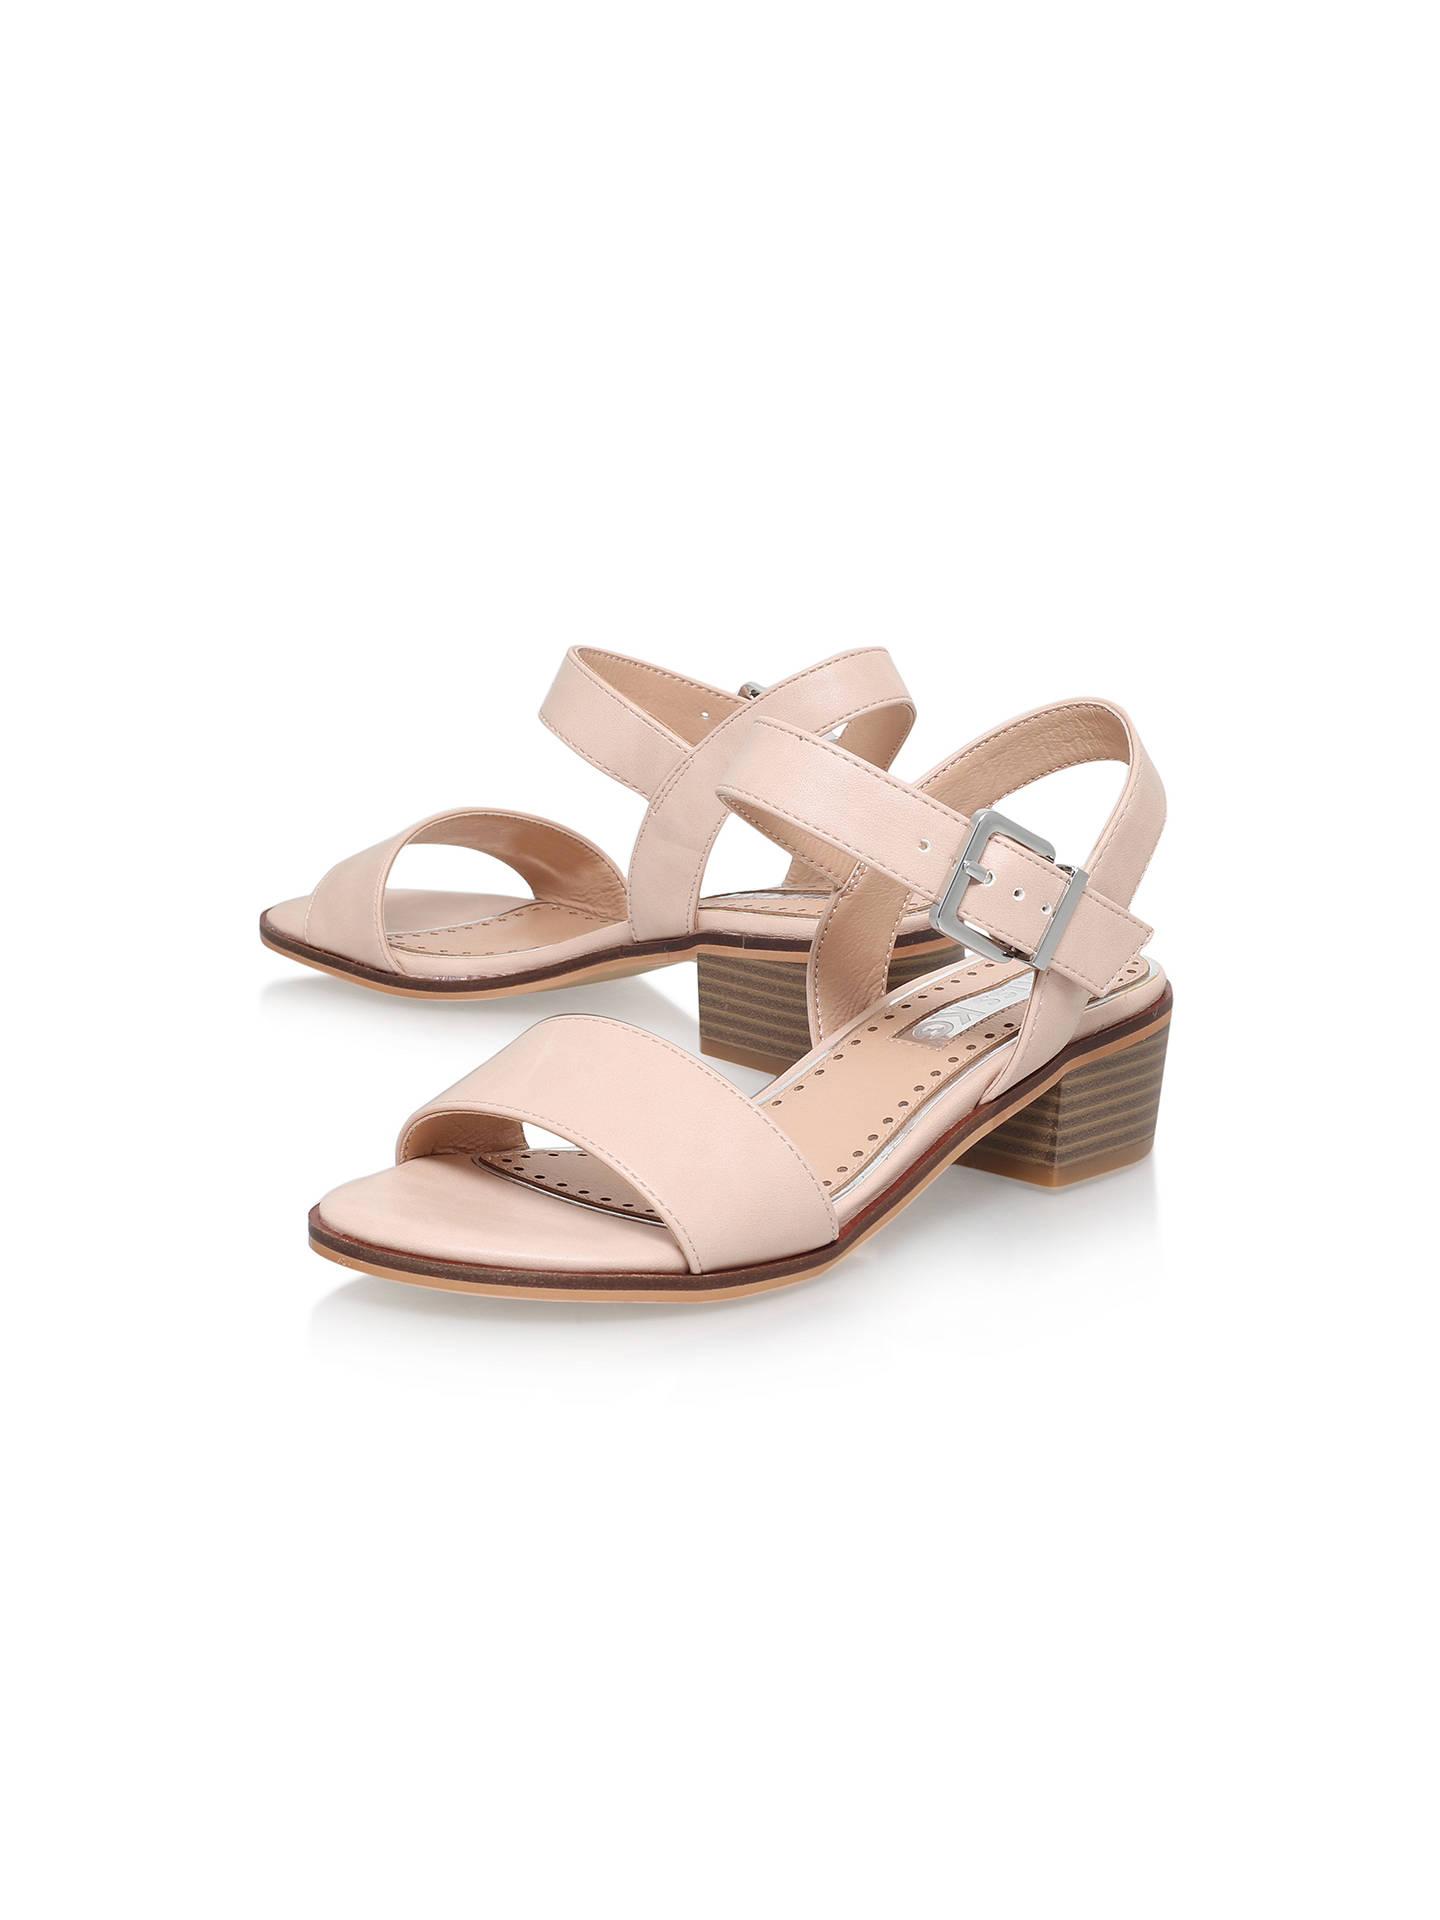 Buy Miss KG Pablo Block Heeled Sandals, Nude   John Lewis